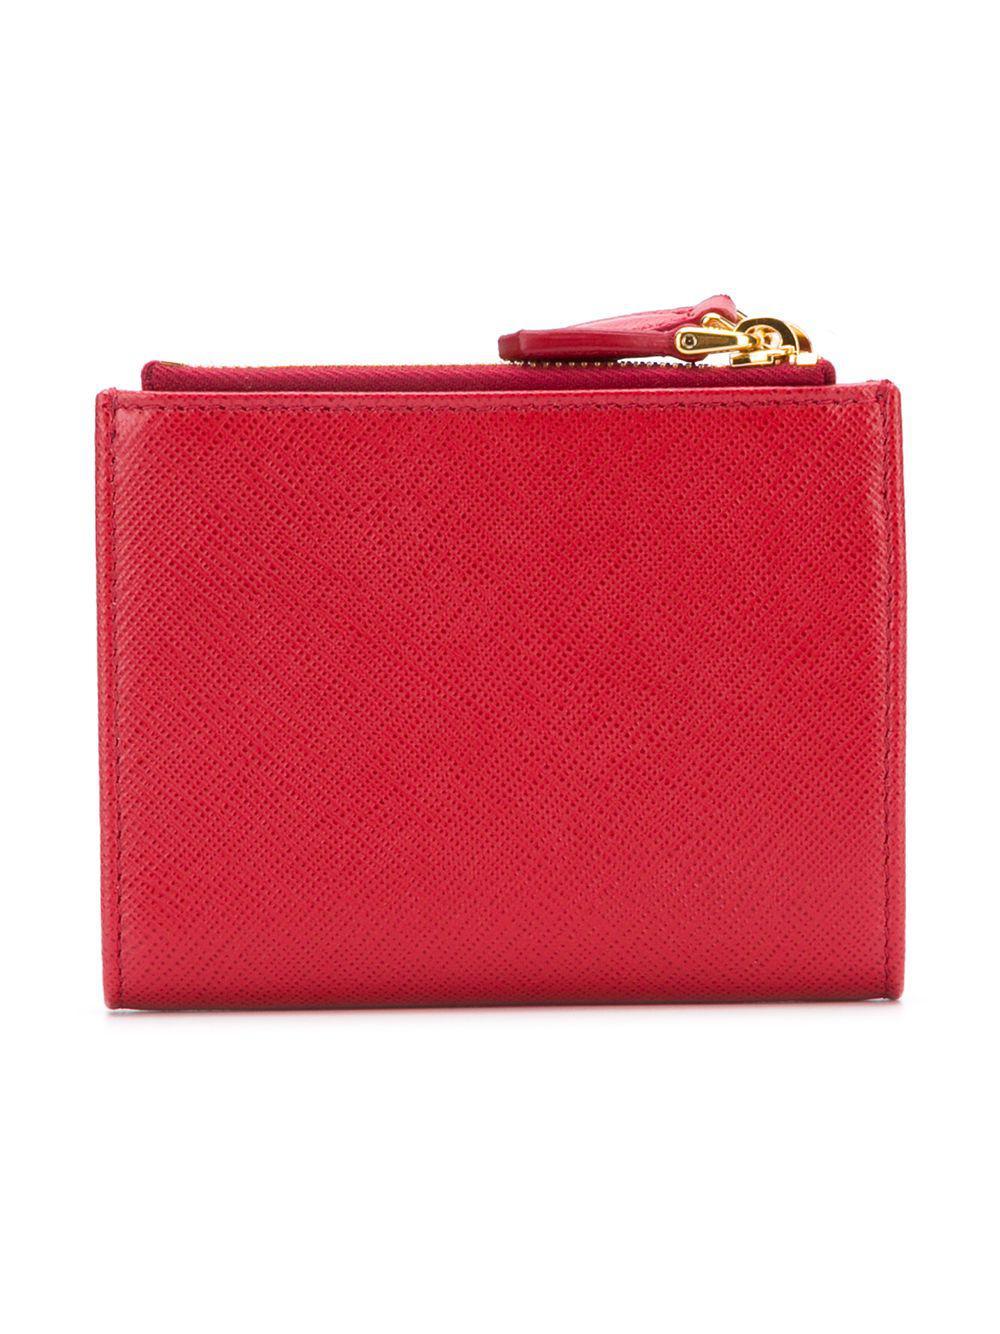 a7265835011a Prada - Red Saffiano Wallet - Lyst. View fullscreen